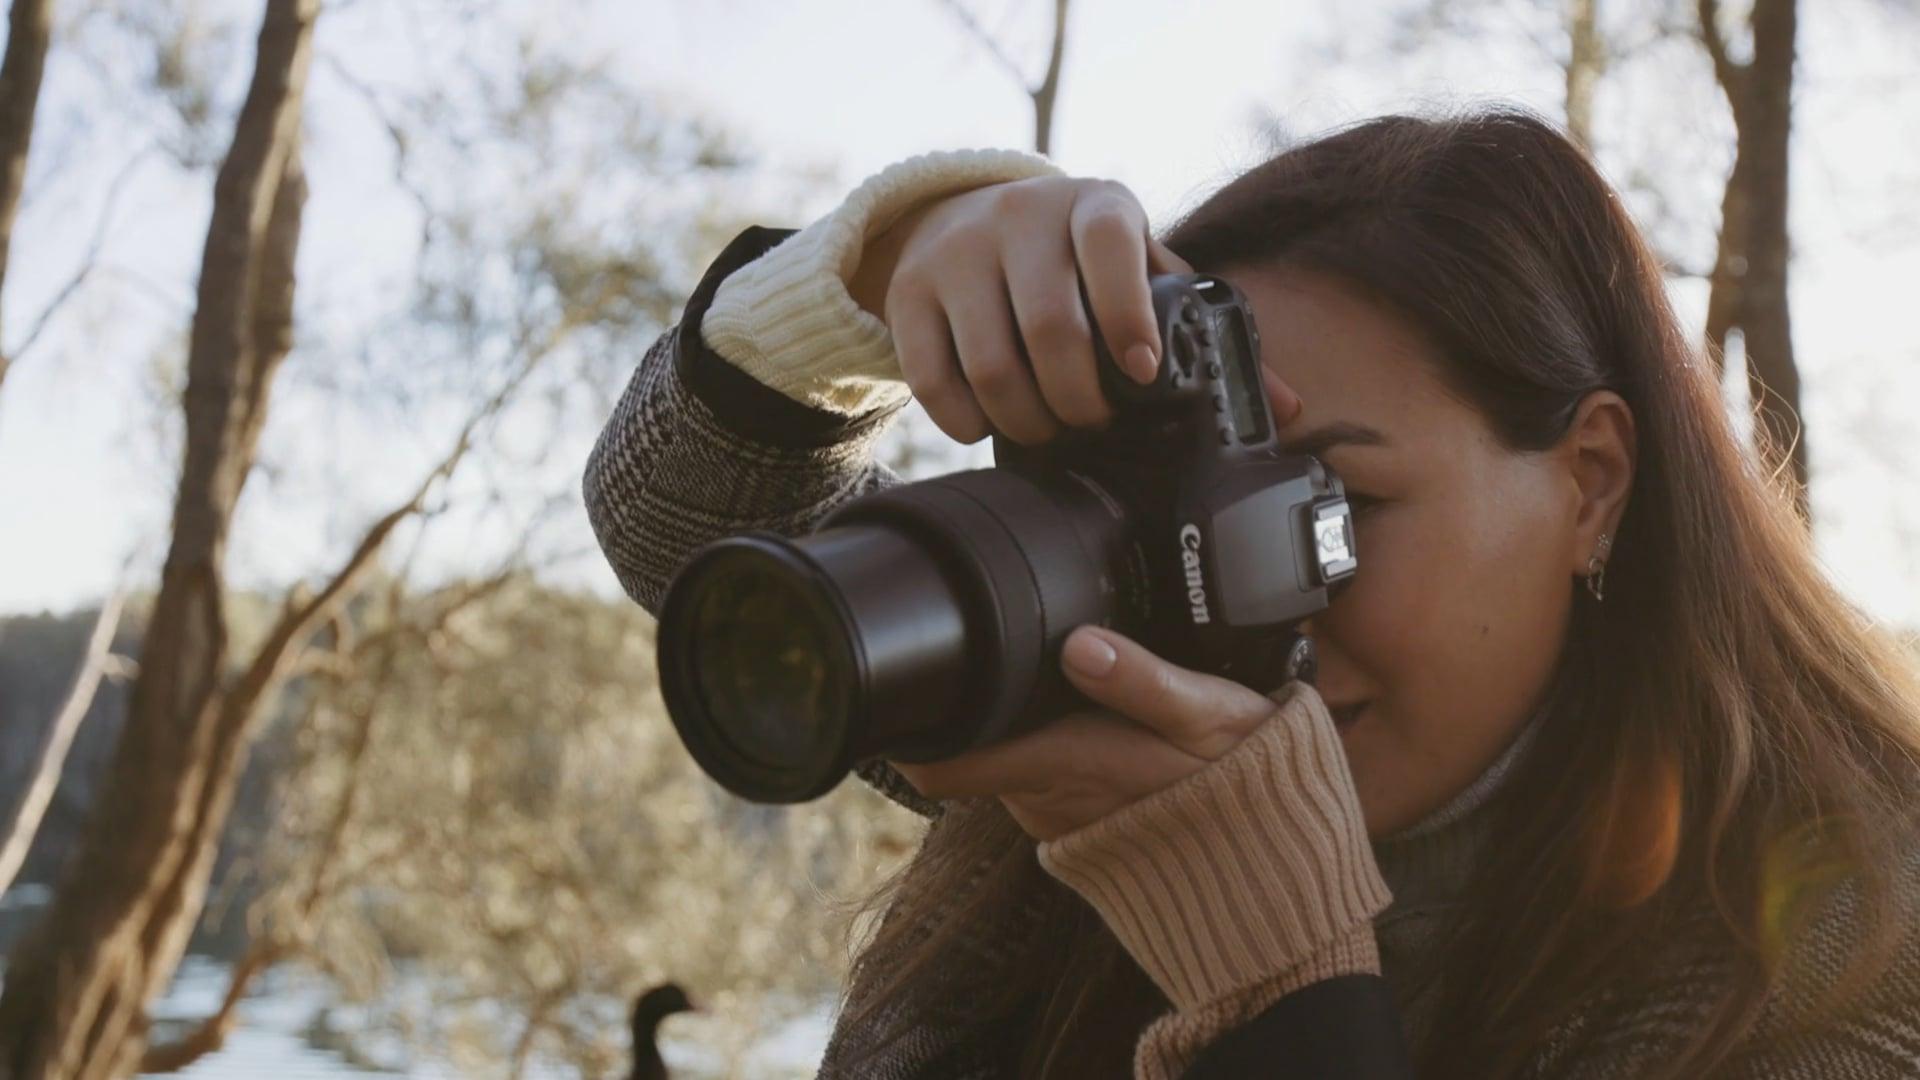 Gemma Peanut - Canon 90D